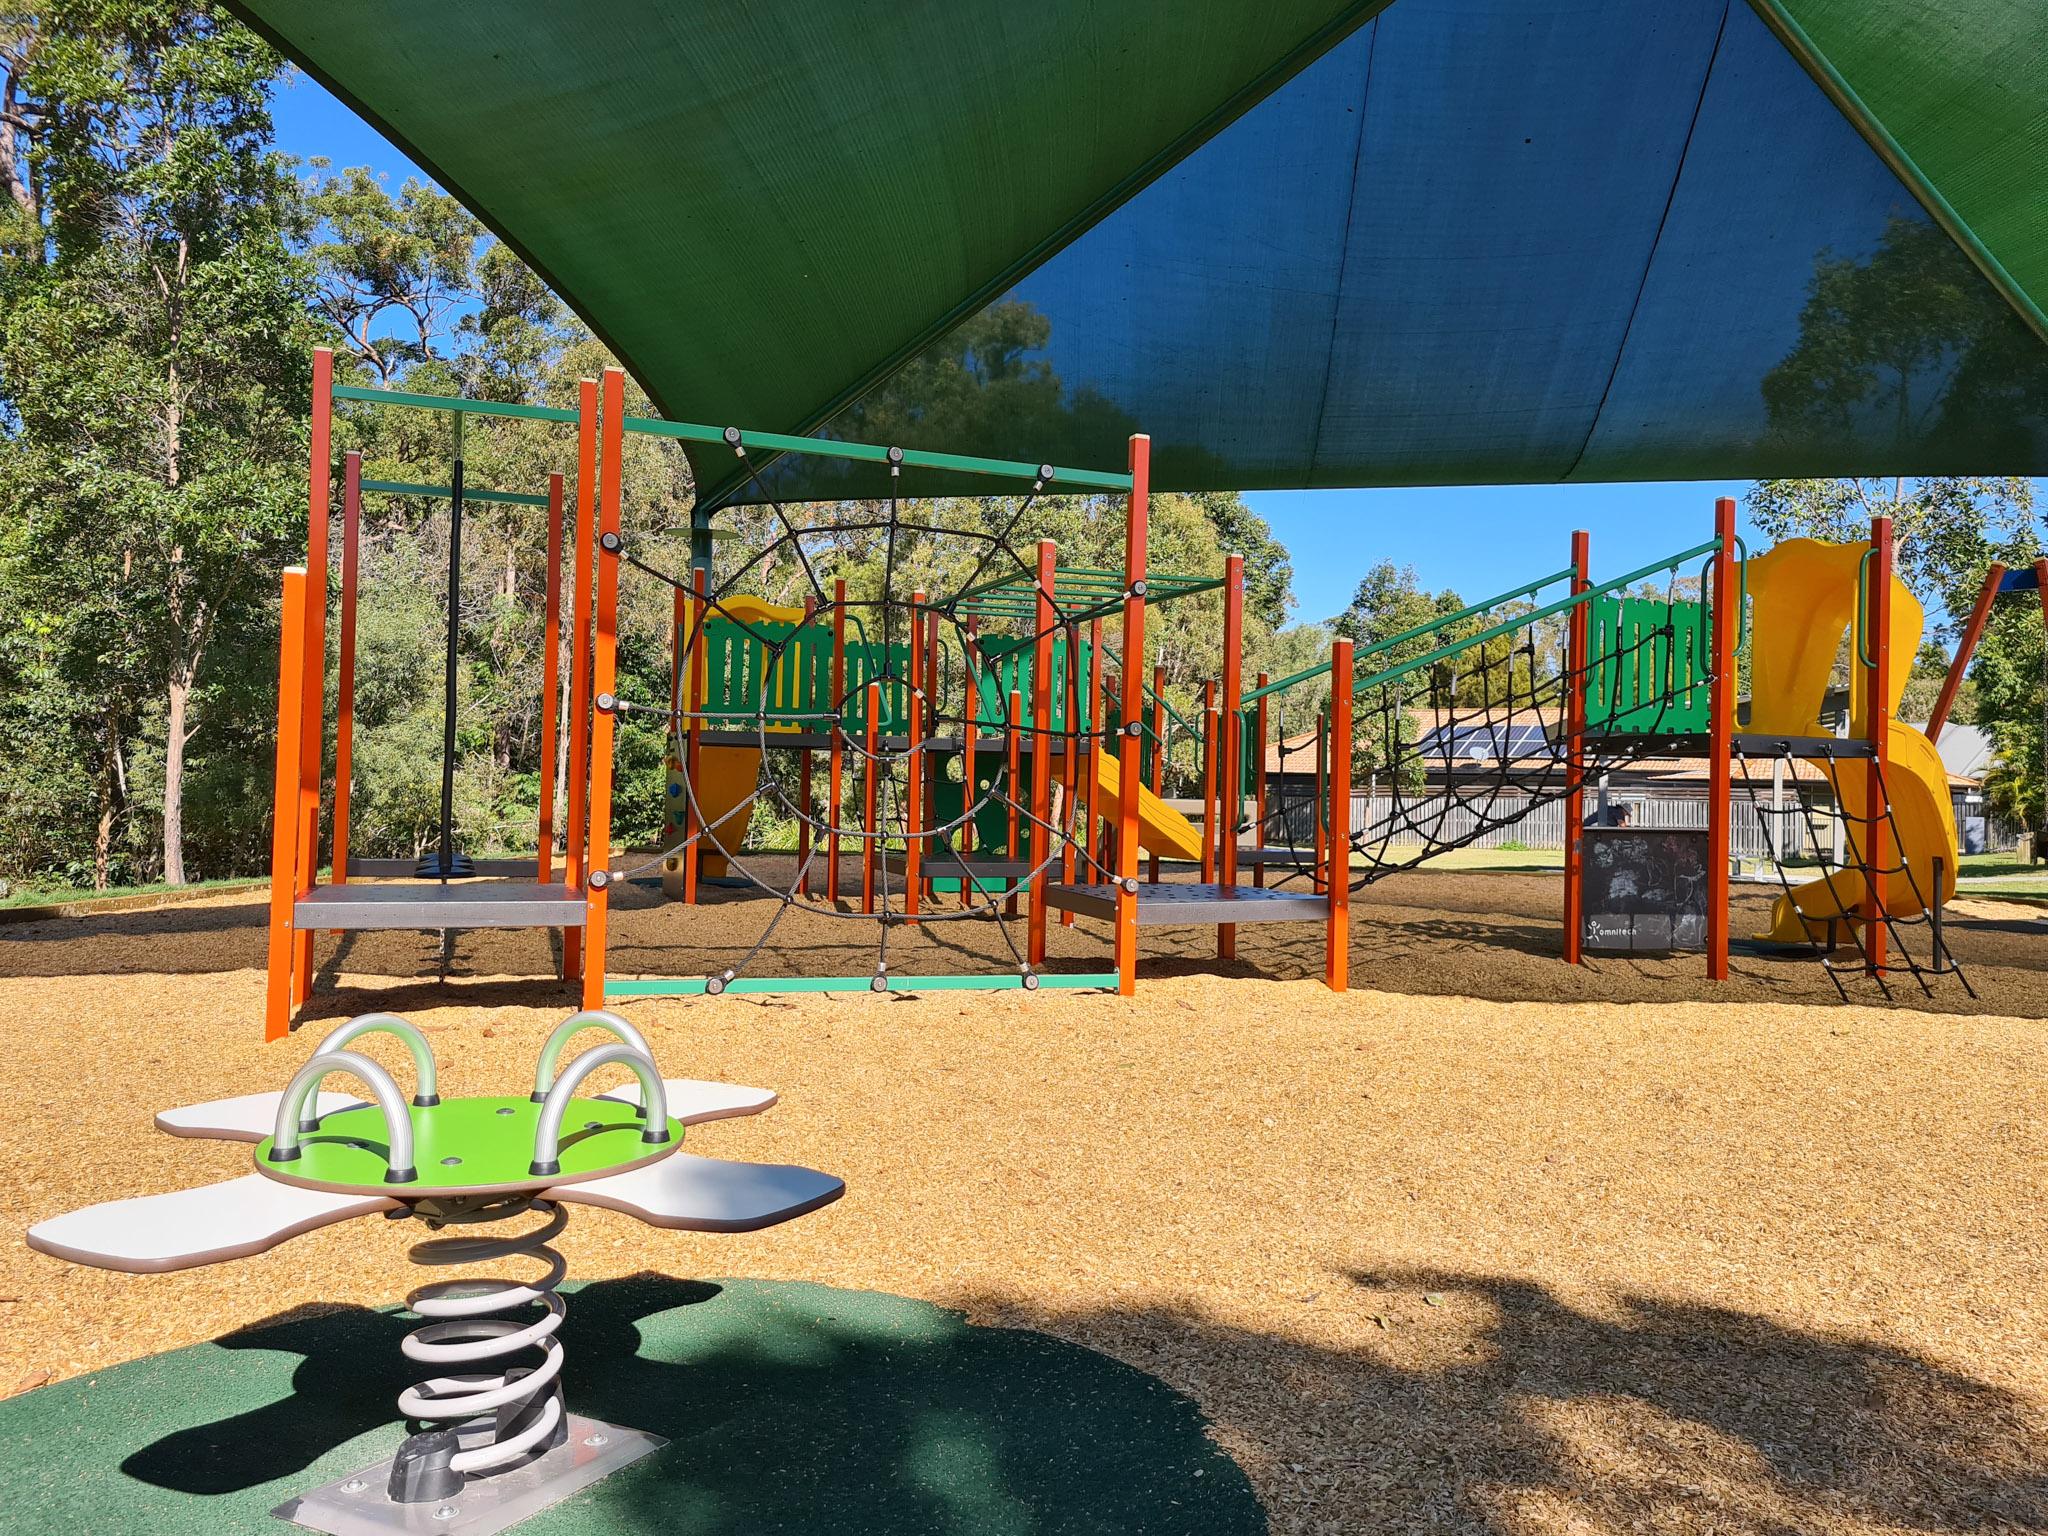 palm-beach-state-school-playrground-austek-play-51